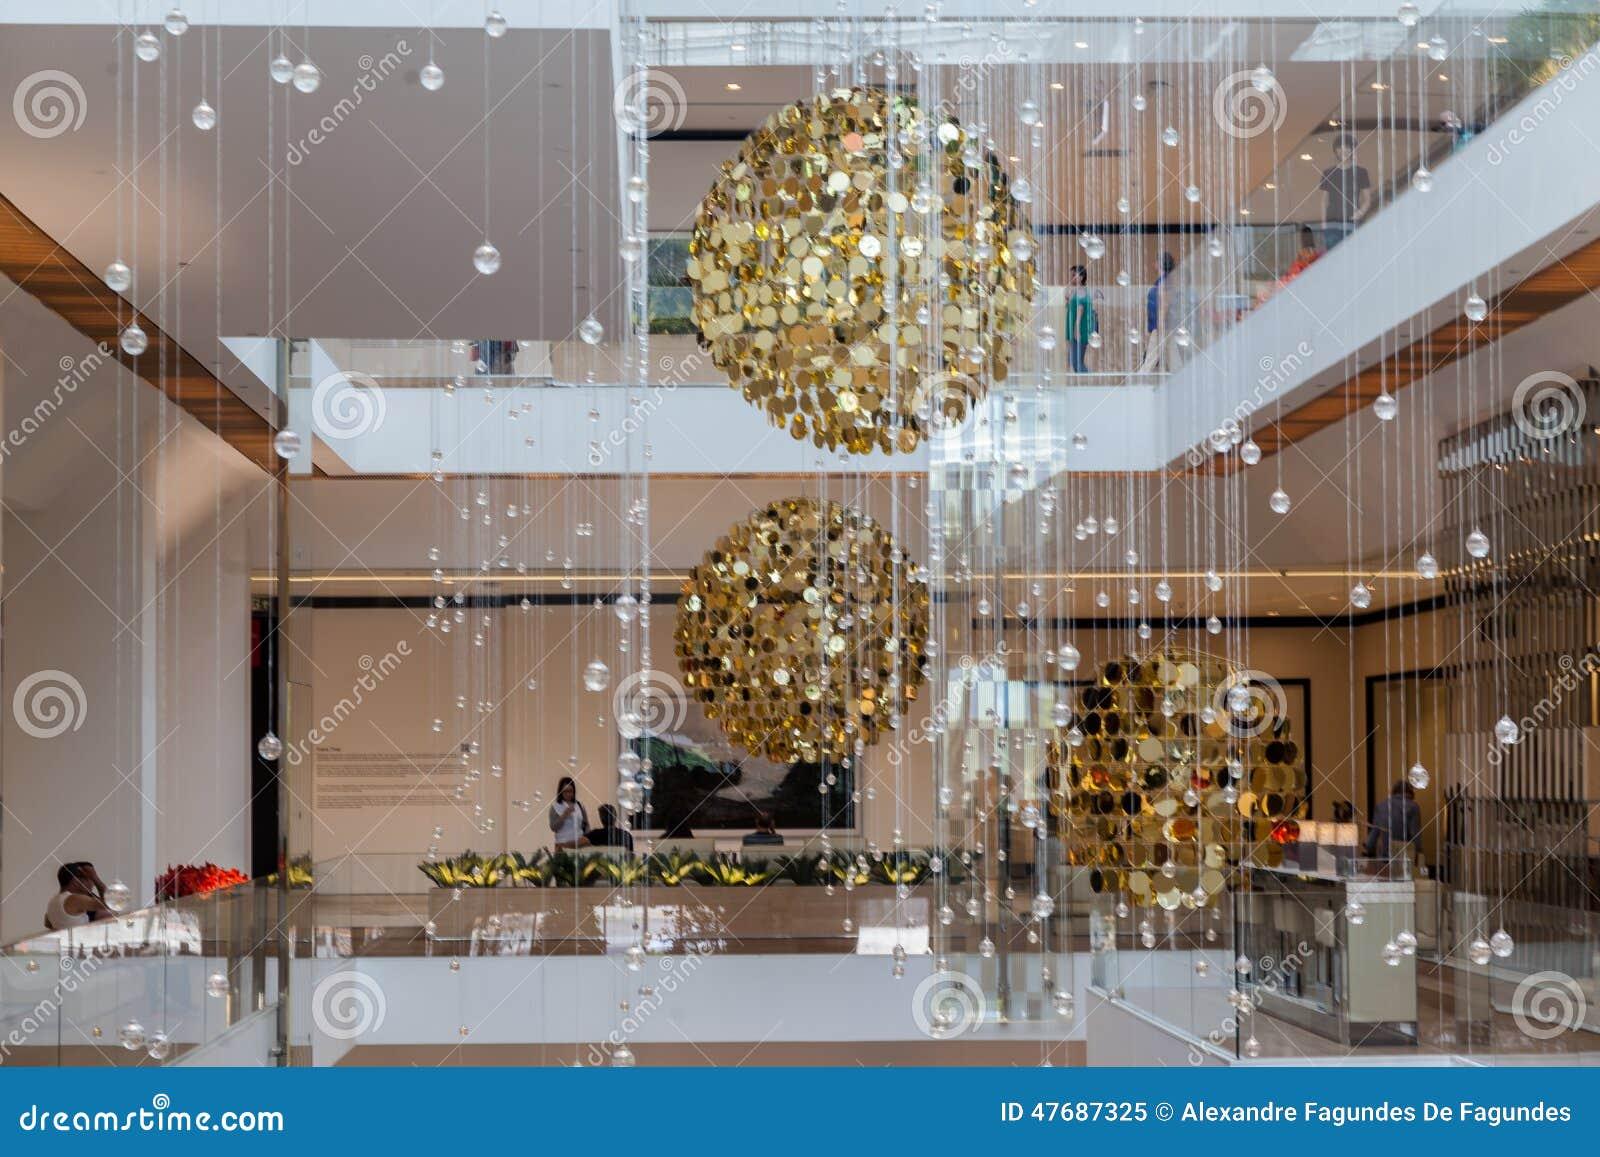 Christmas Hanging Ceiling Decorations Christmas Decoration Jk Mall Sao Paulo Editorial Image  Image .